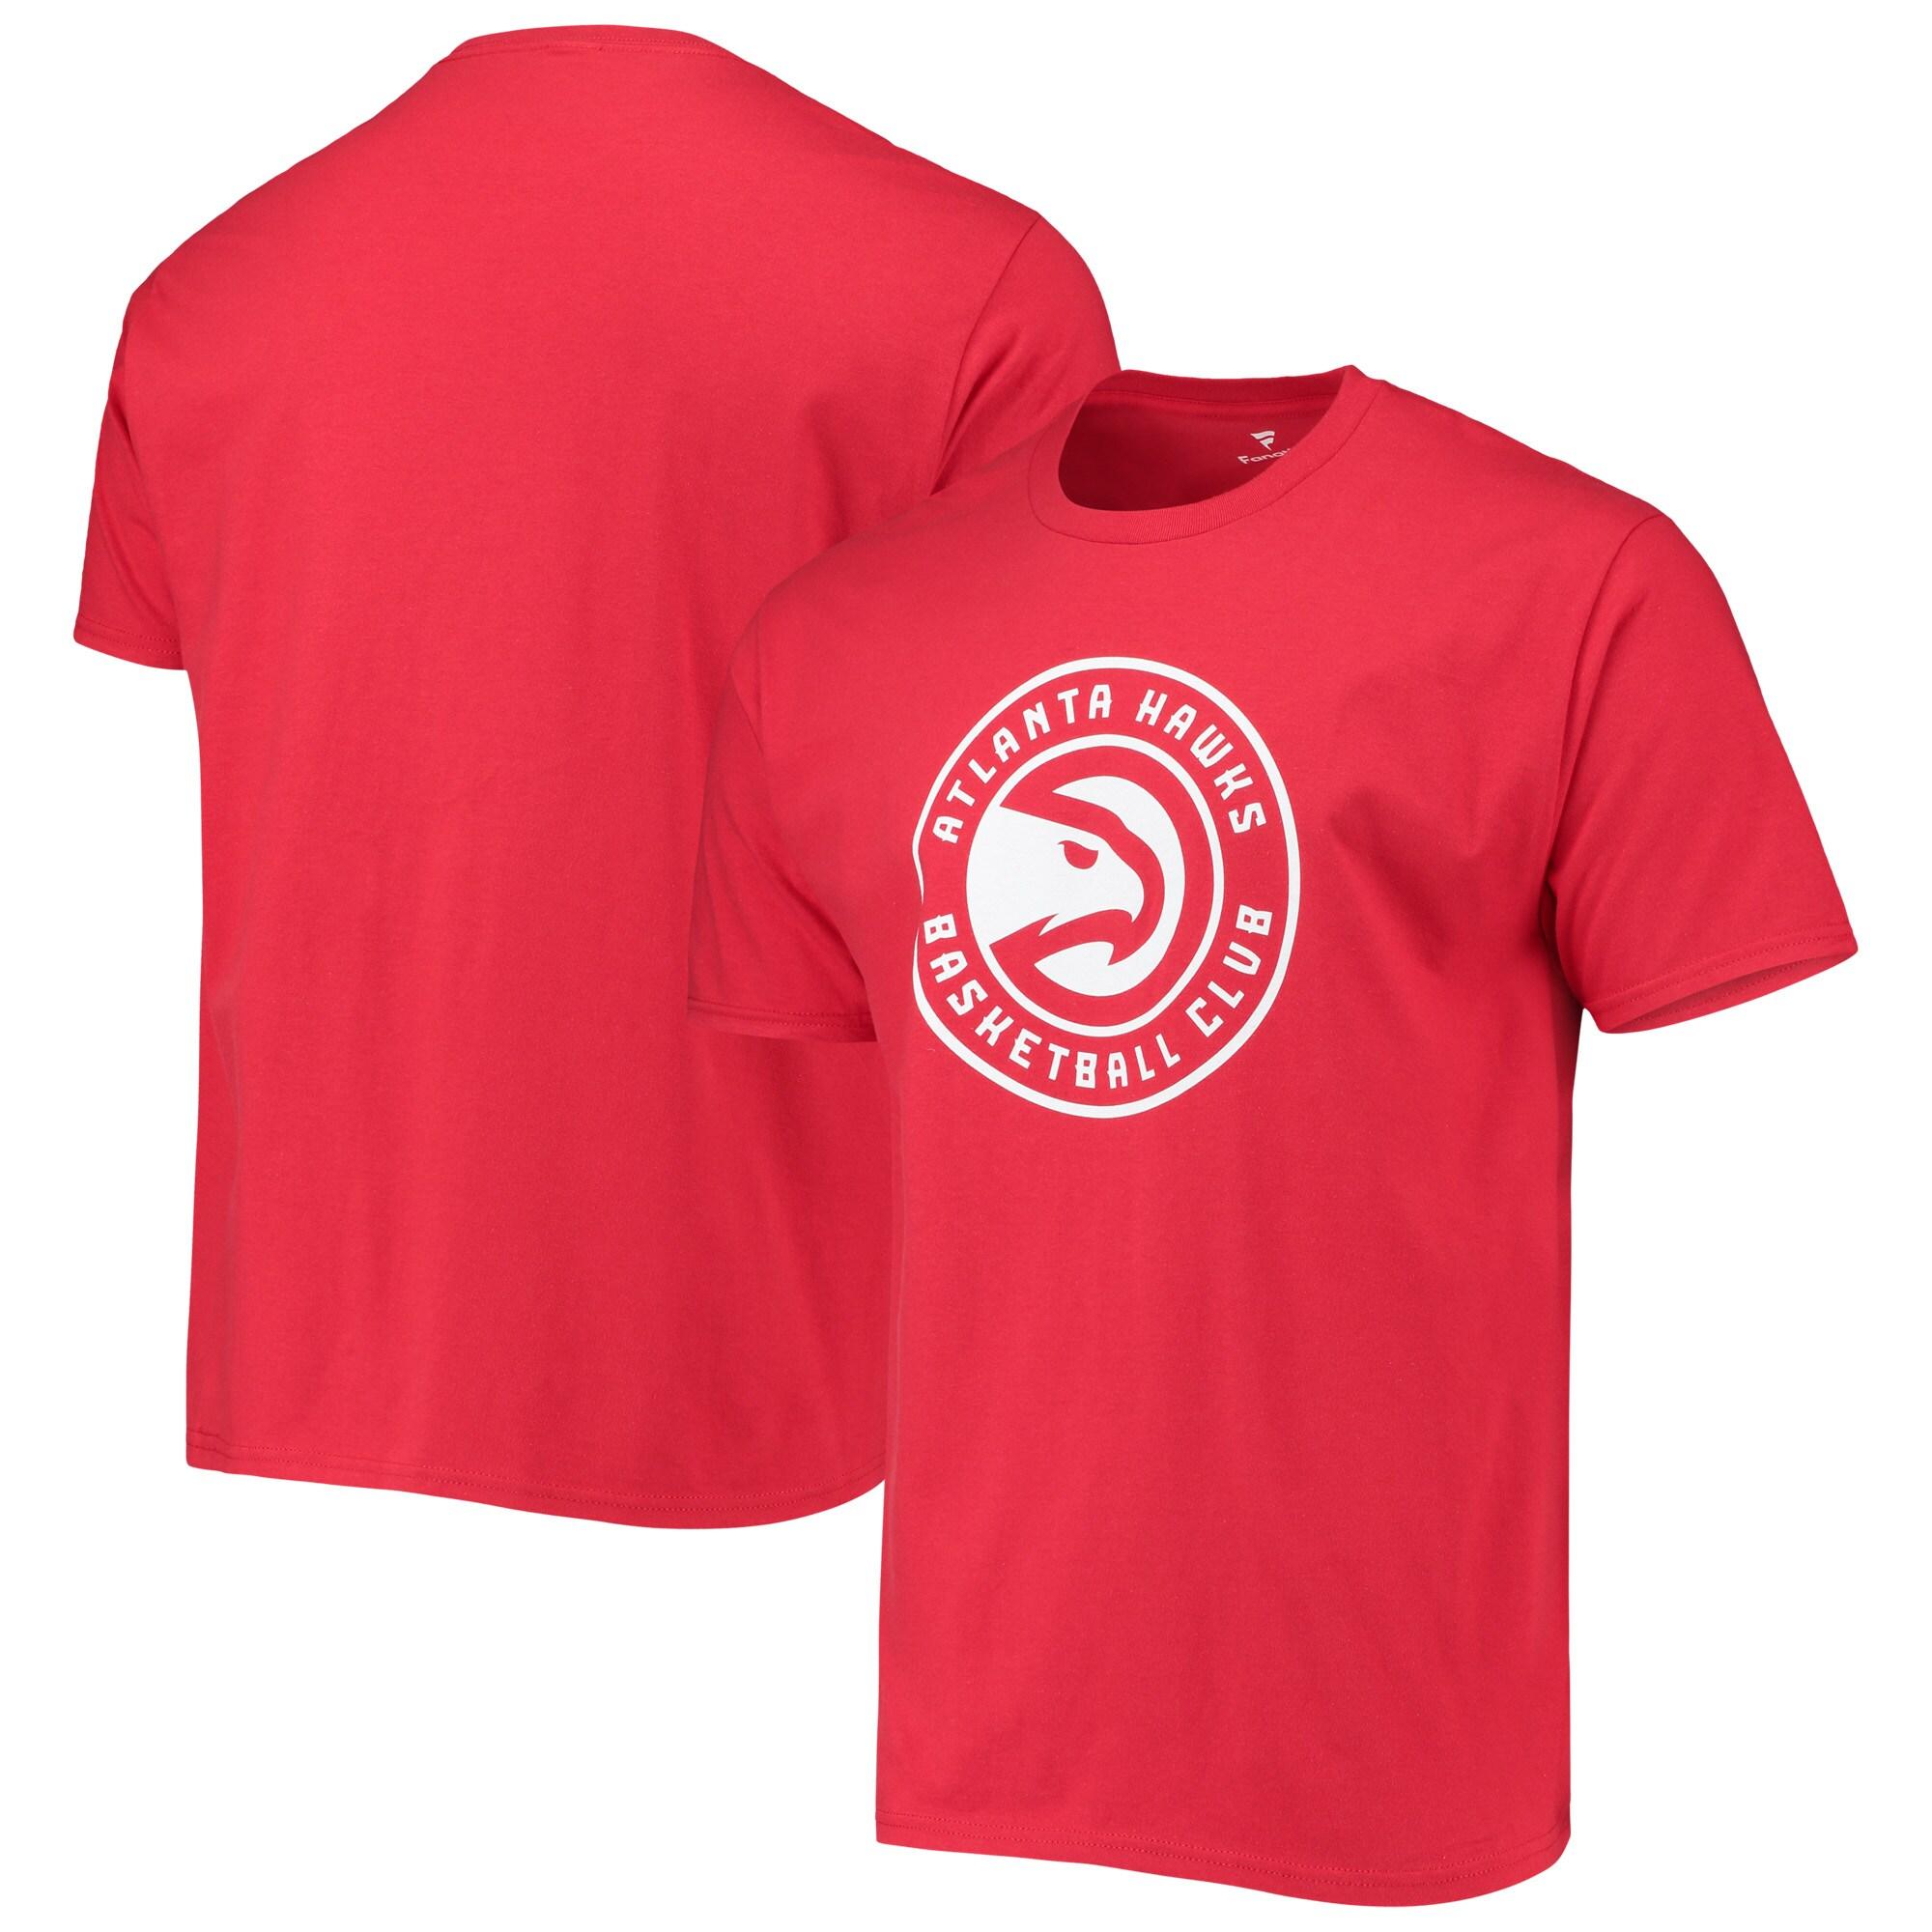 Atlanta Hawks Primary Logo T-Shirt - Red